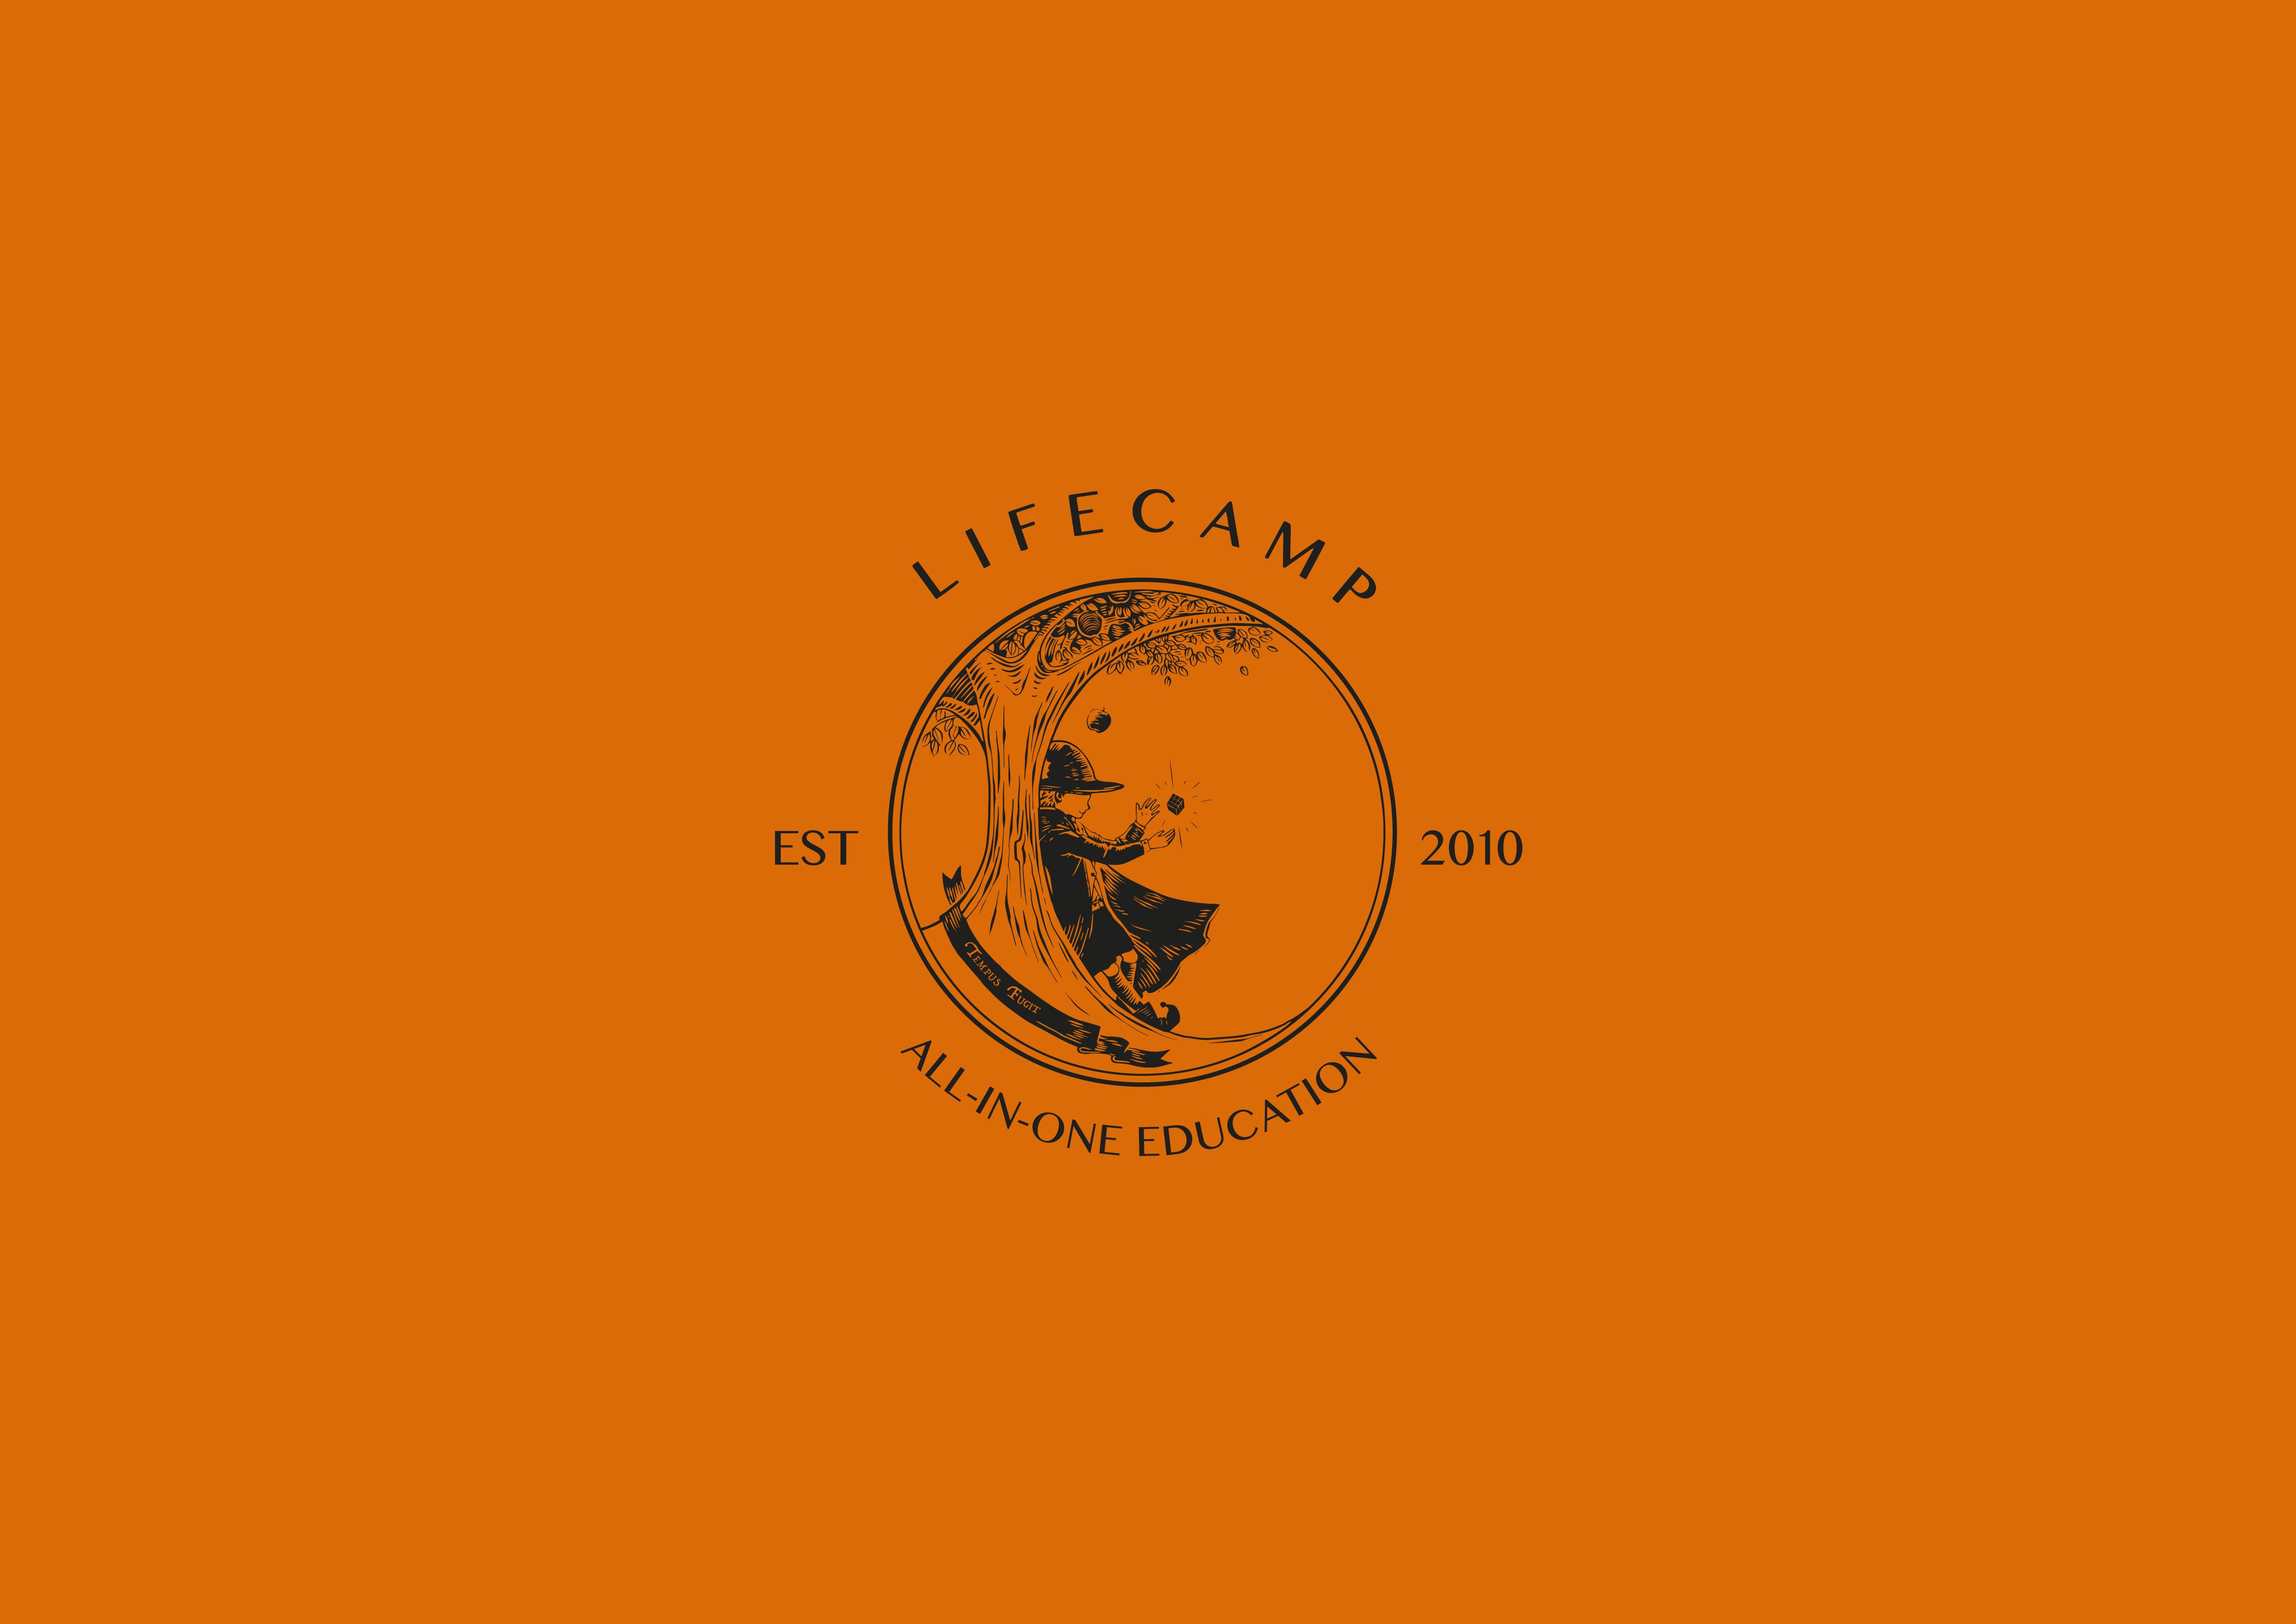 lifecamp 网页长图-11